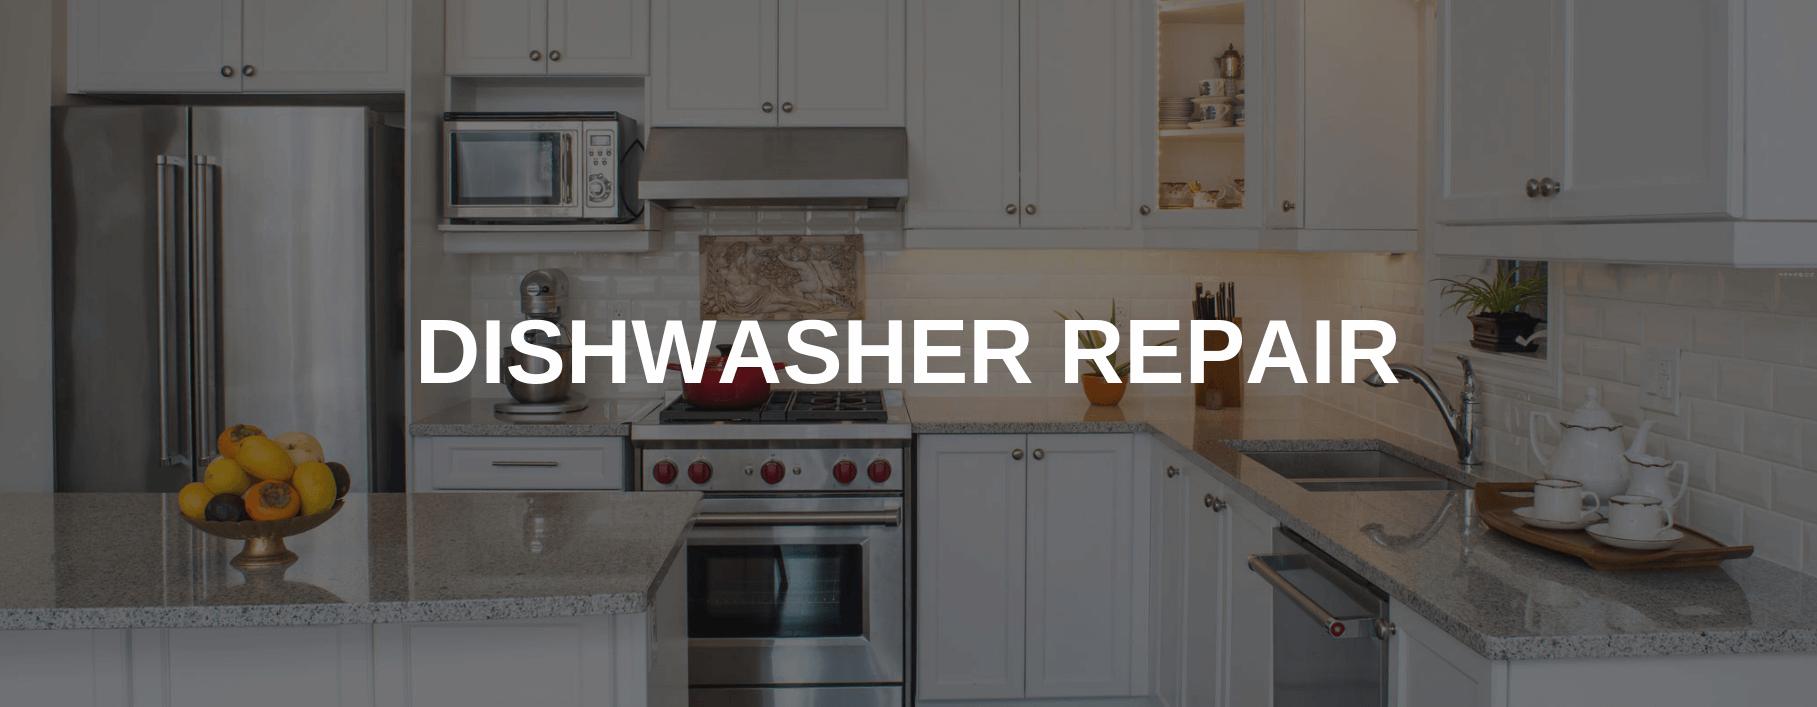 dishwasher repair woodland hills